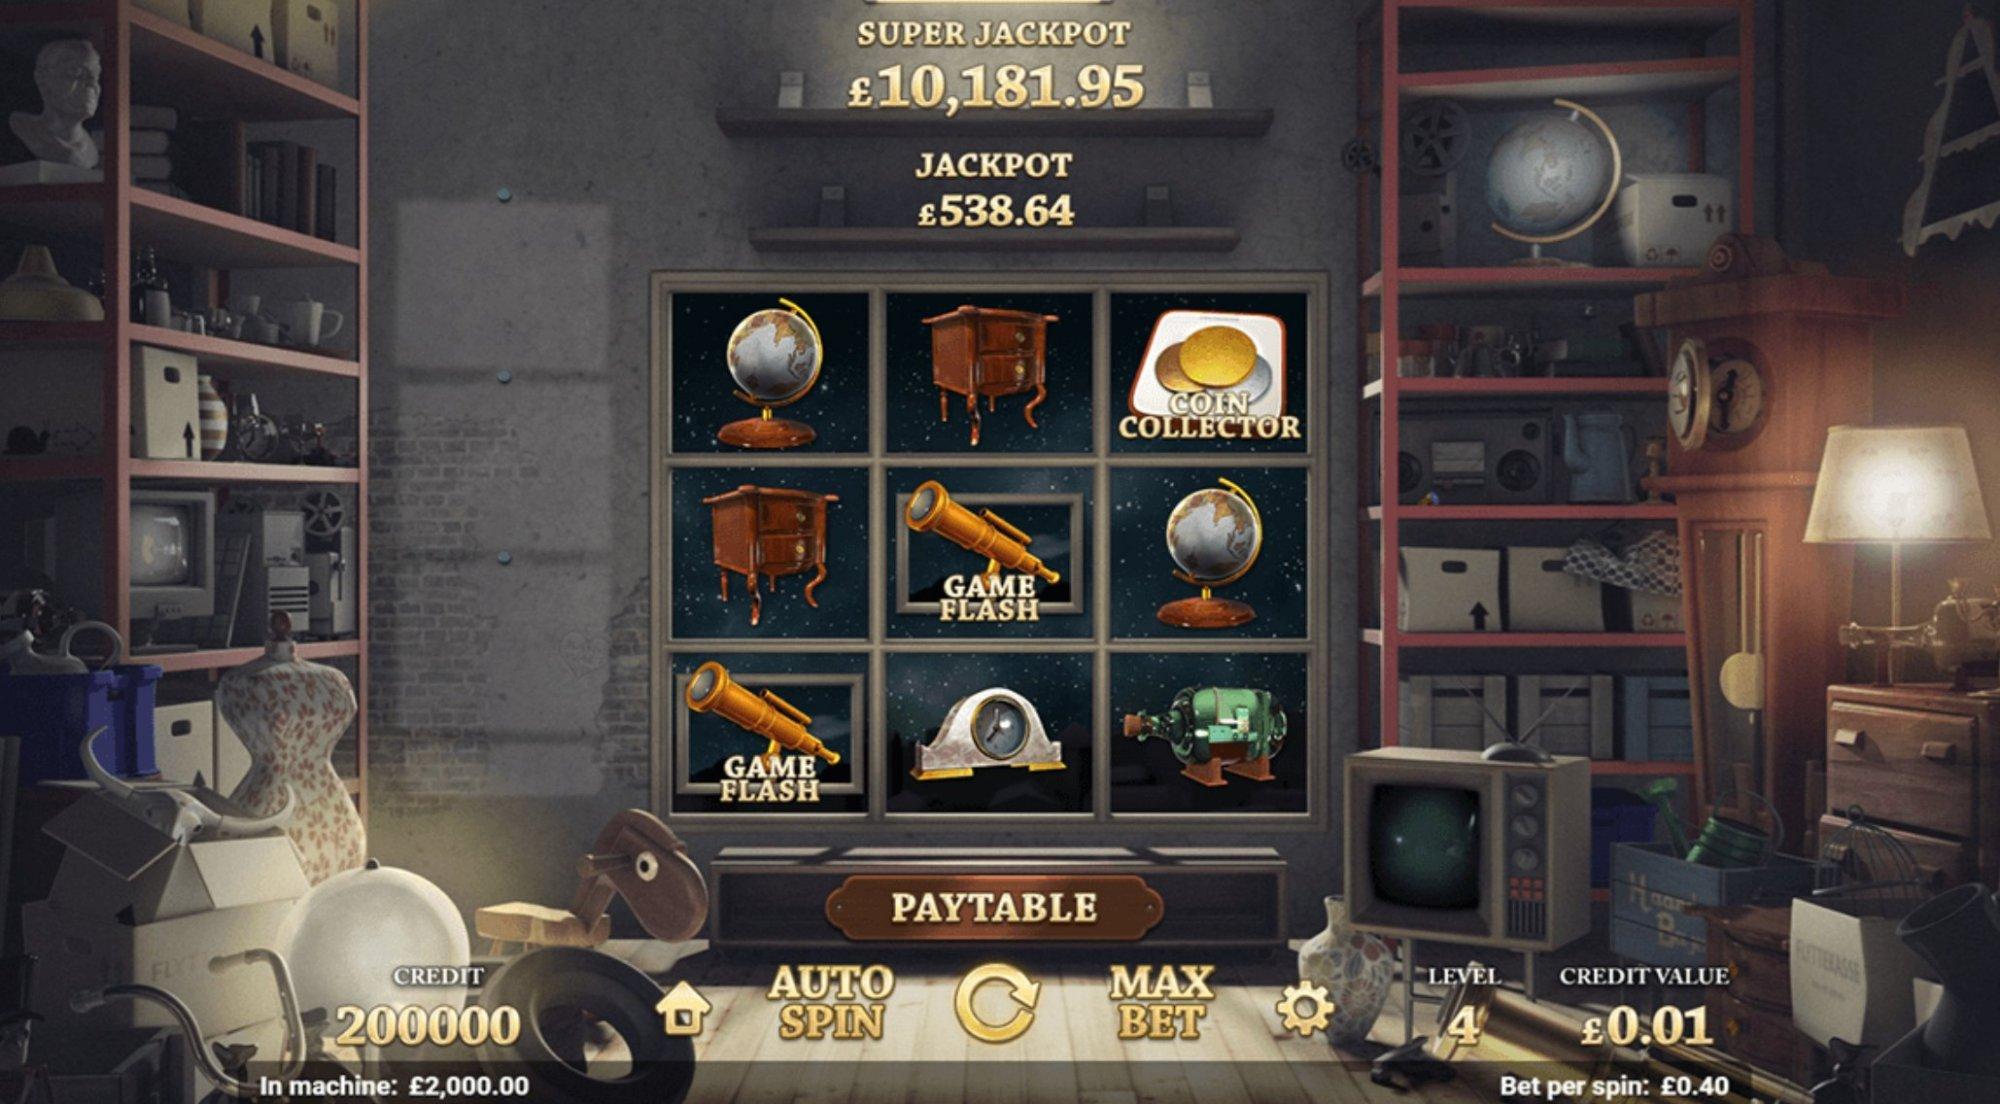 Prøv Auction day spillemaskine